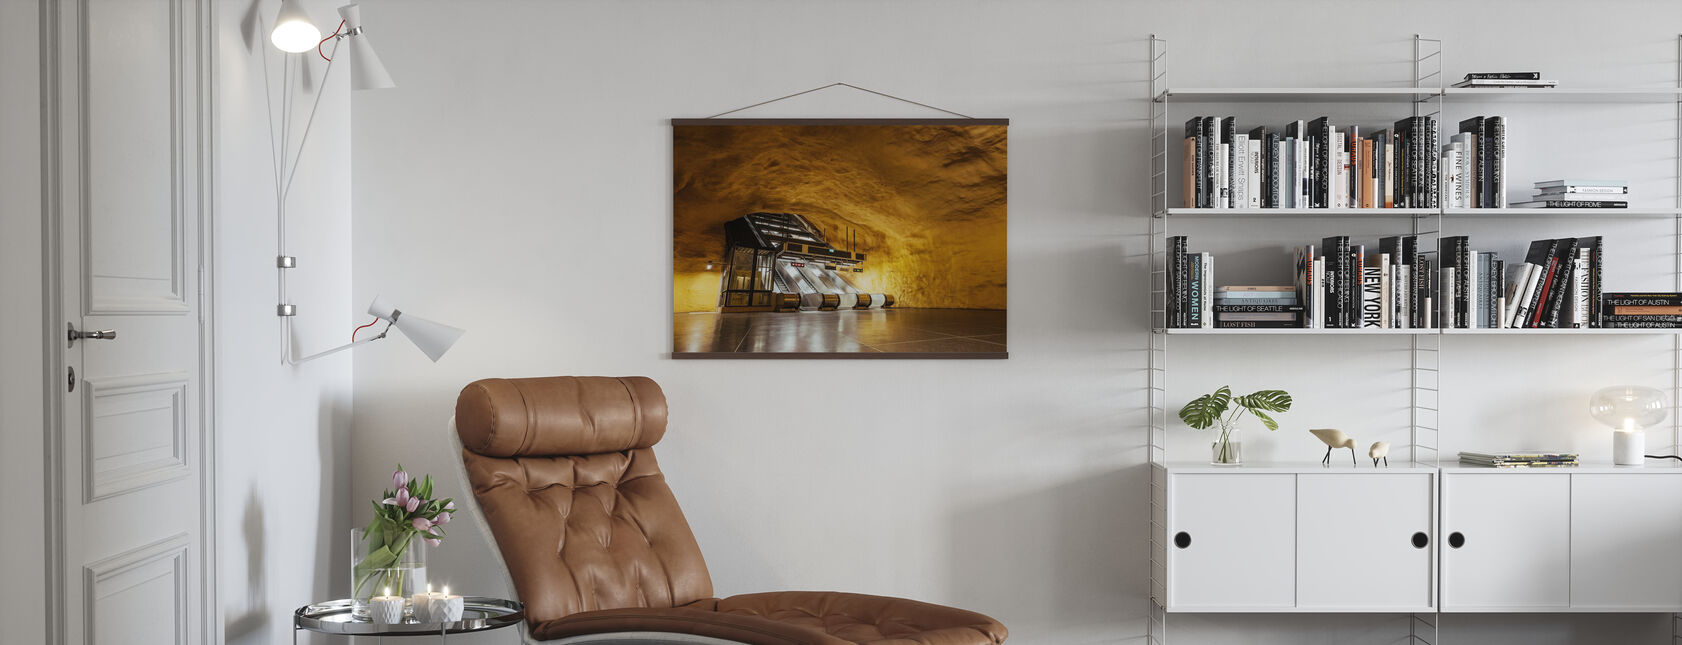 Subway Escalator - Poster - Living Room